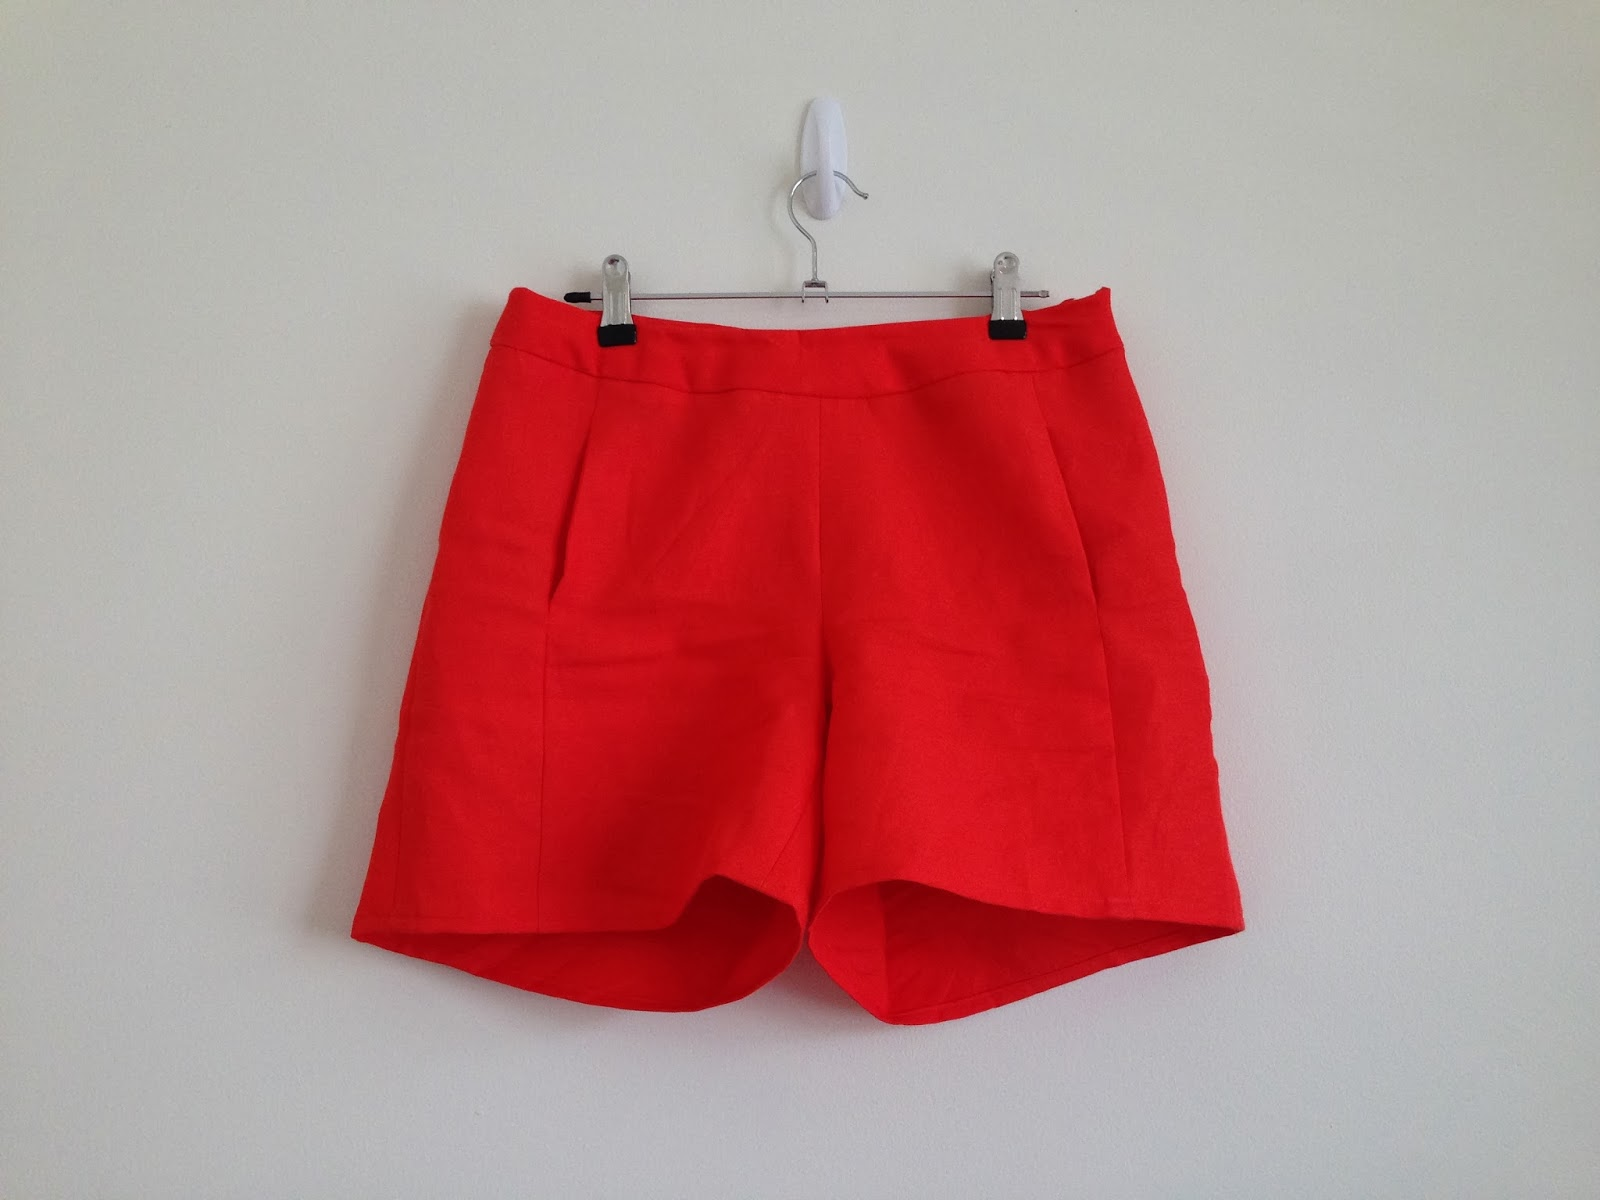 Colette Iris Shorts